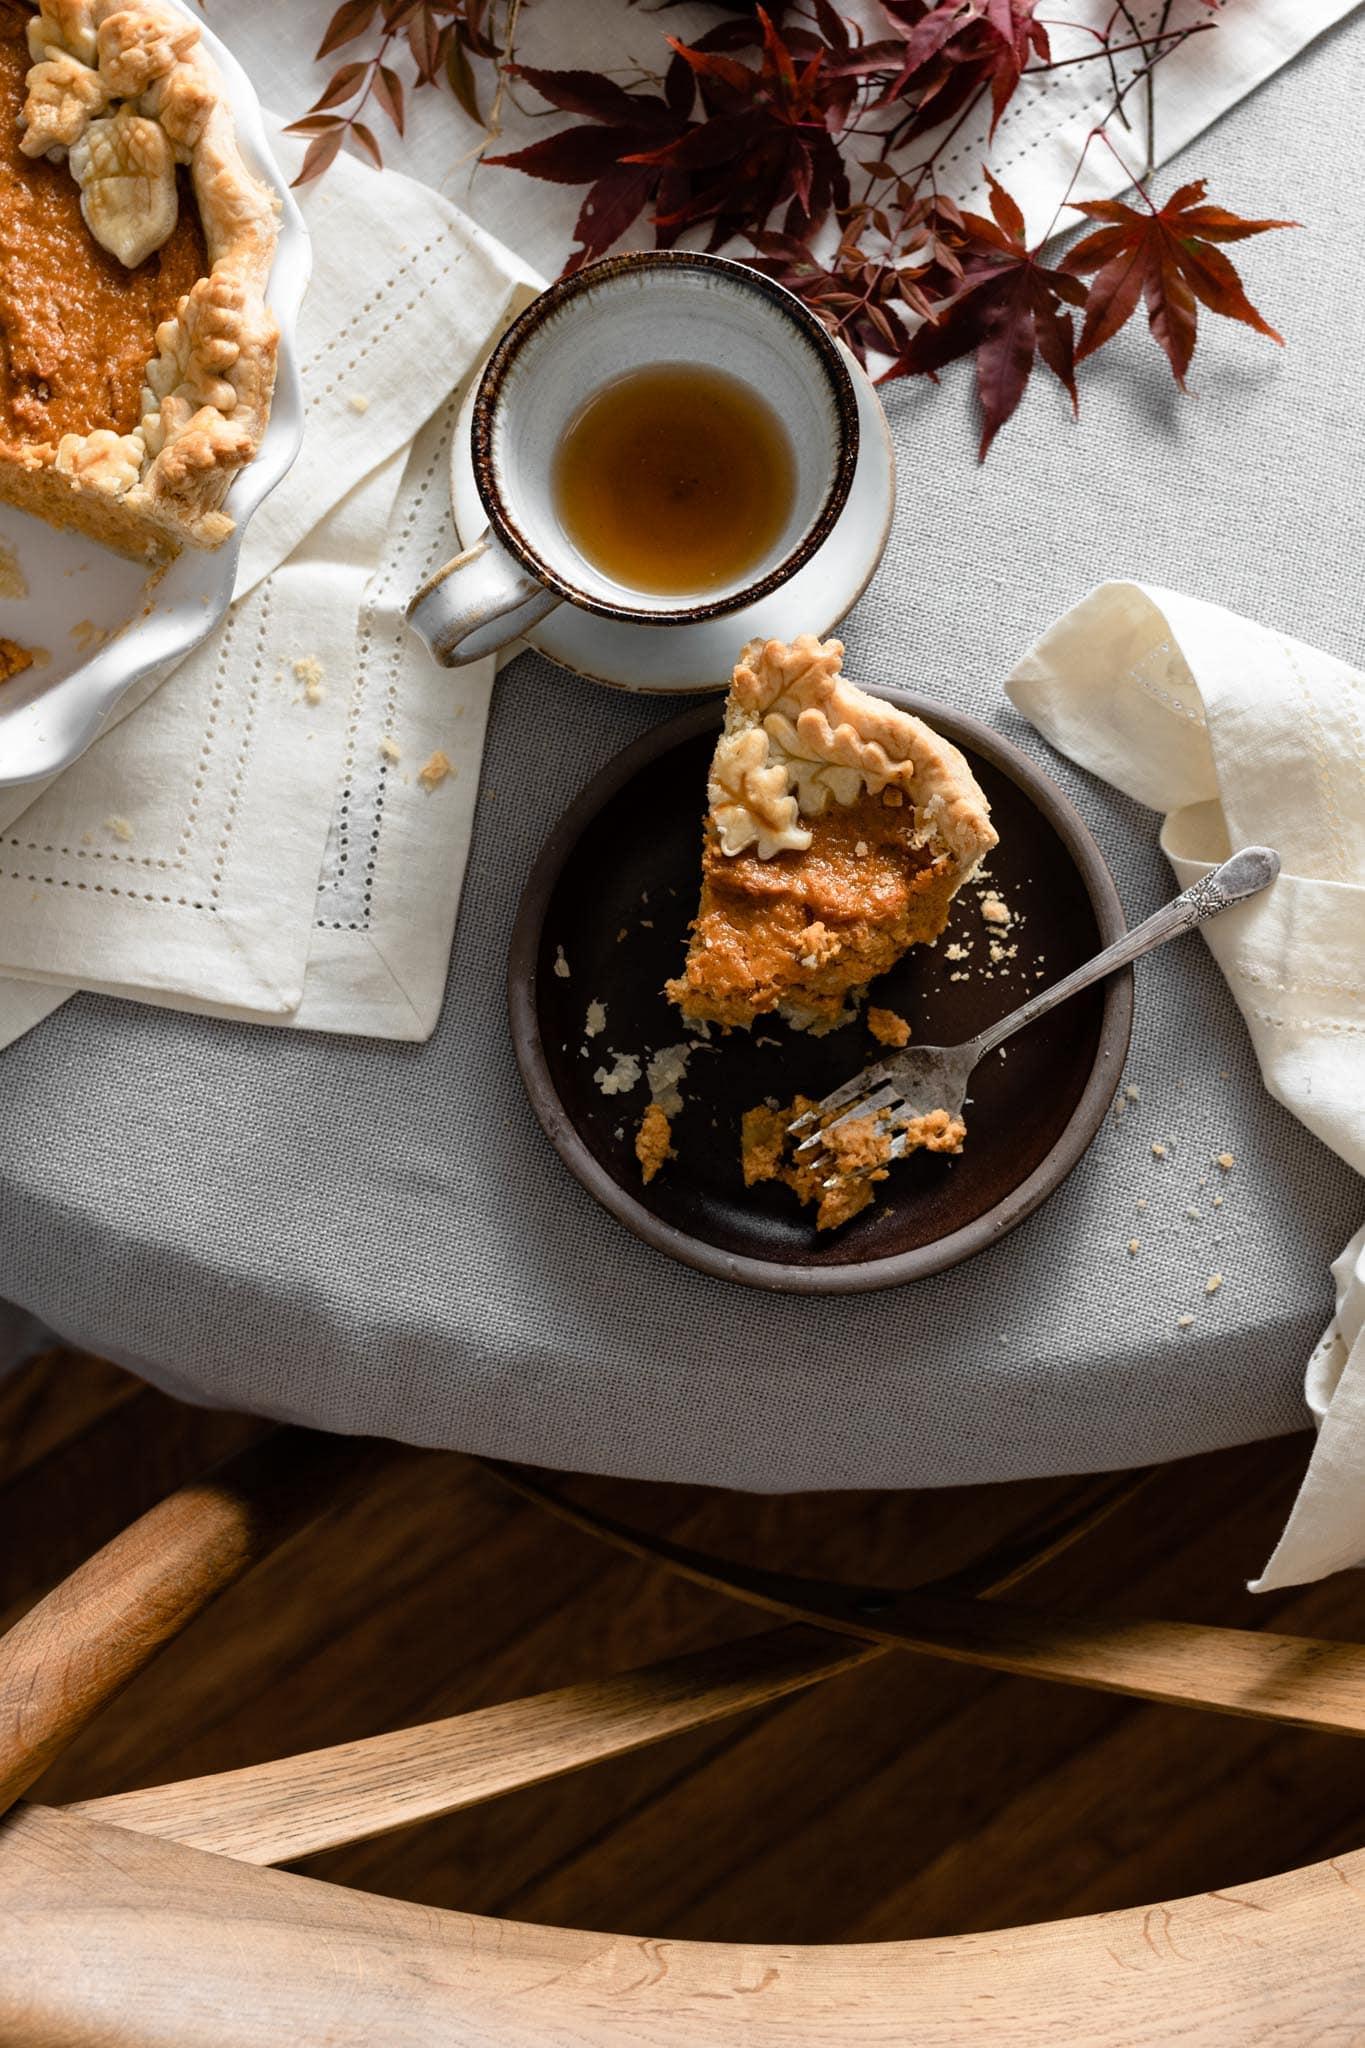 Sweet Potato Pie and tea for thanksgiving dessert